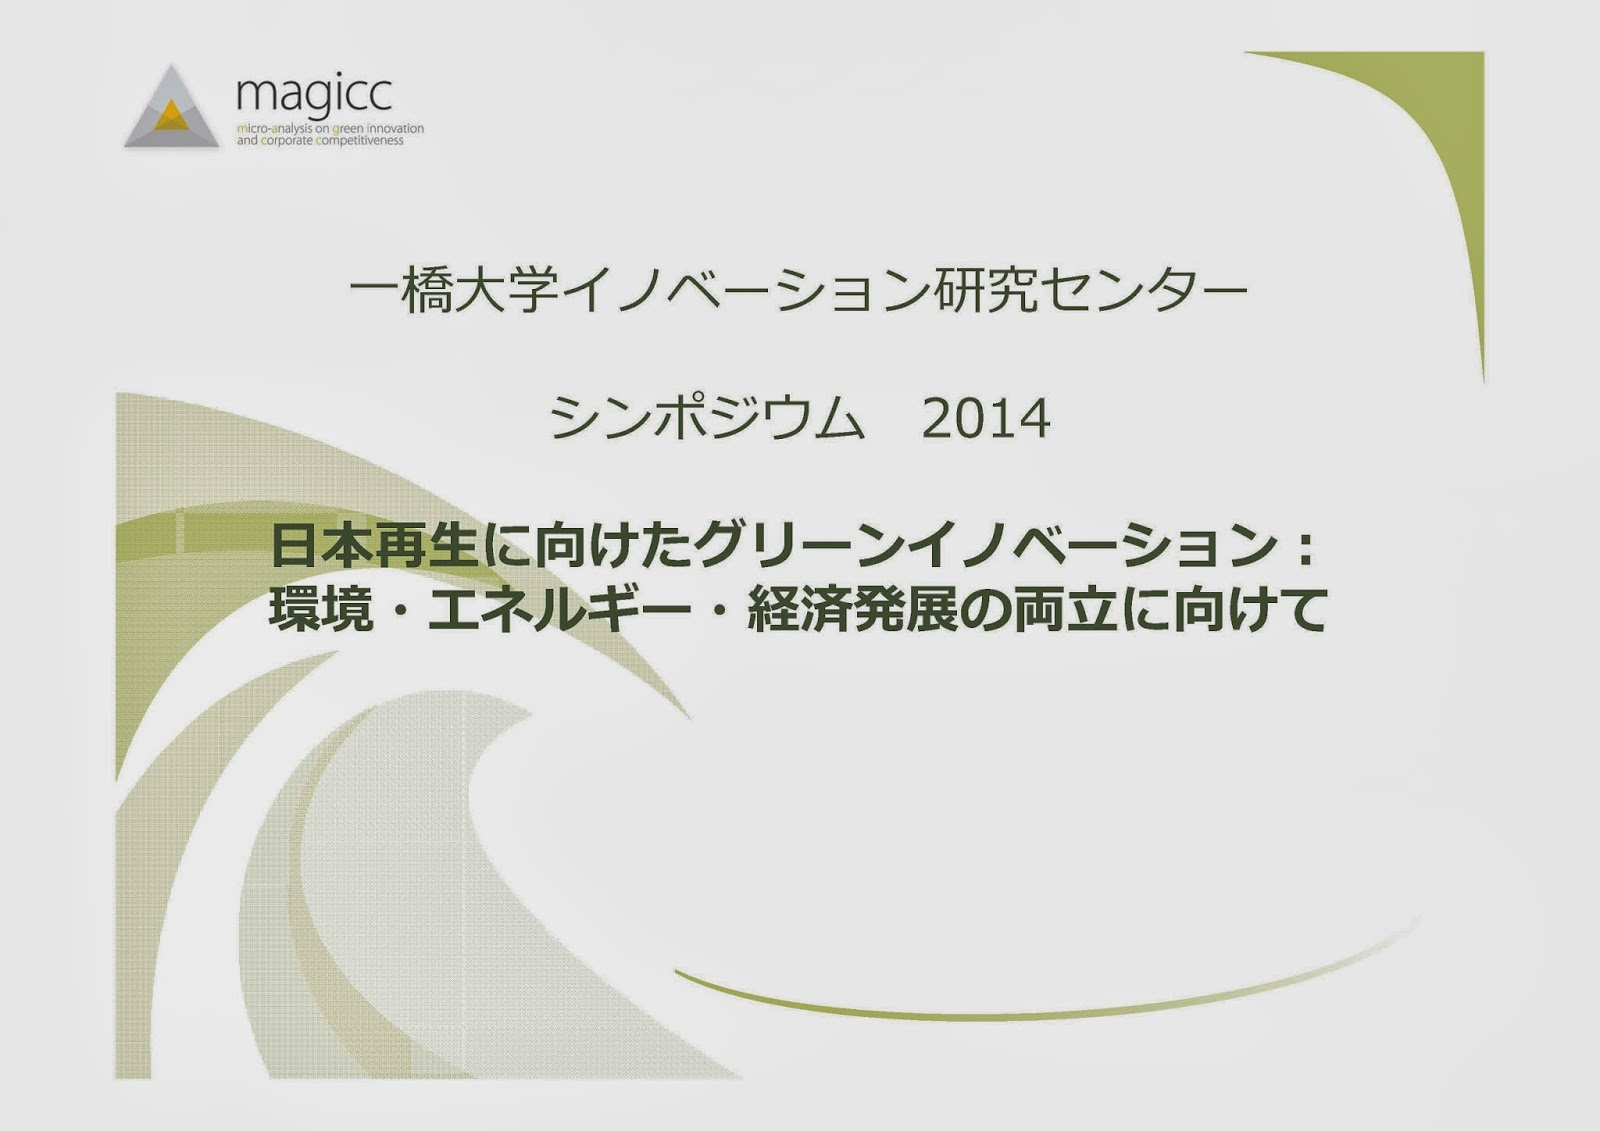 magicc シンポジウム2014 ◆◆参加受付中(申込みフォーム)◆◆